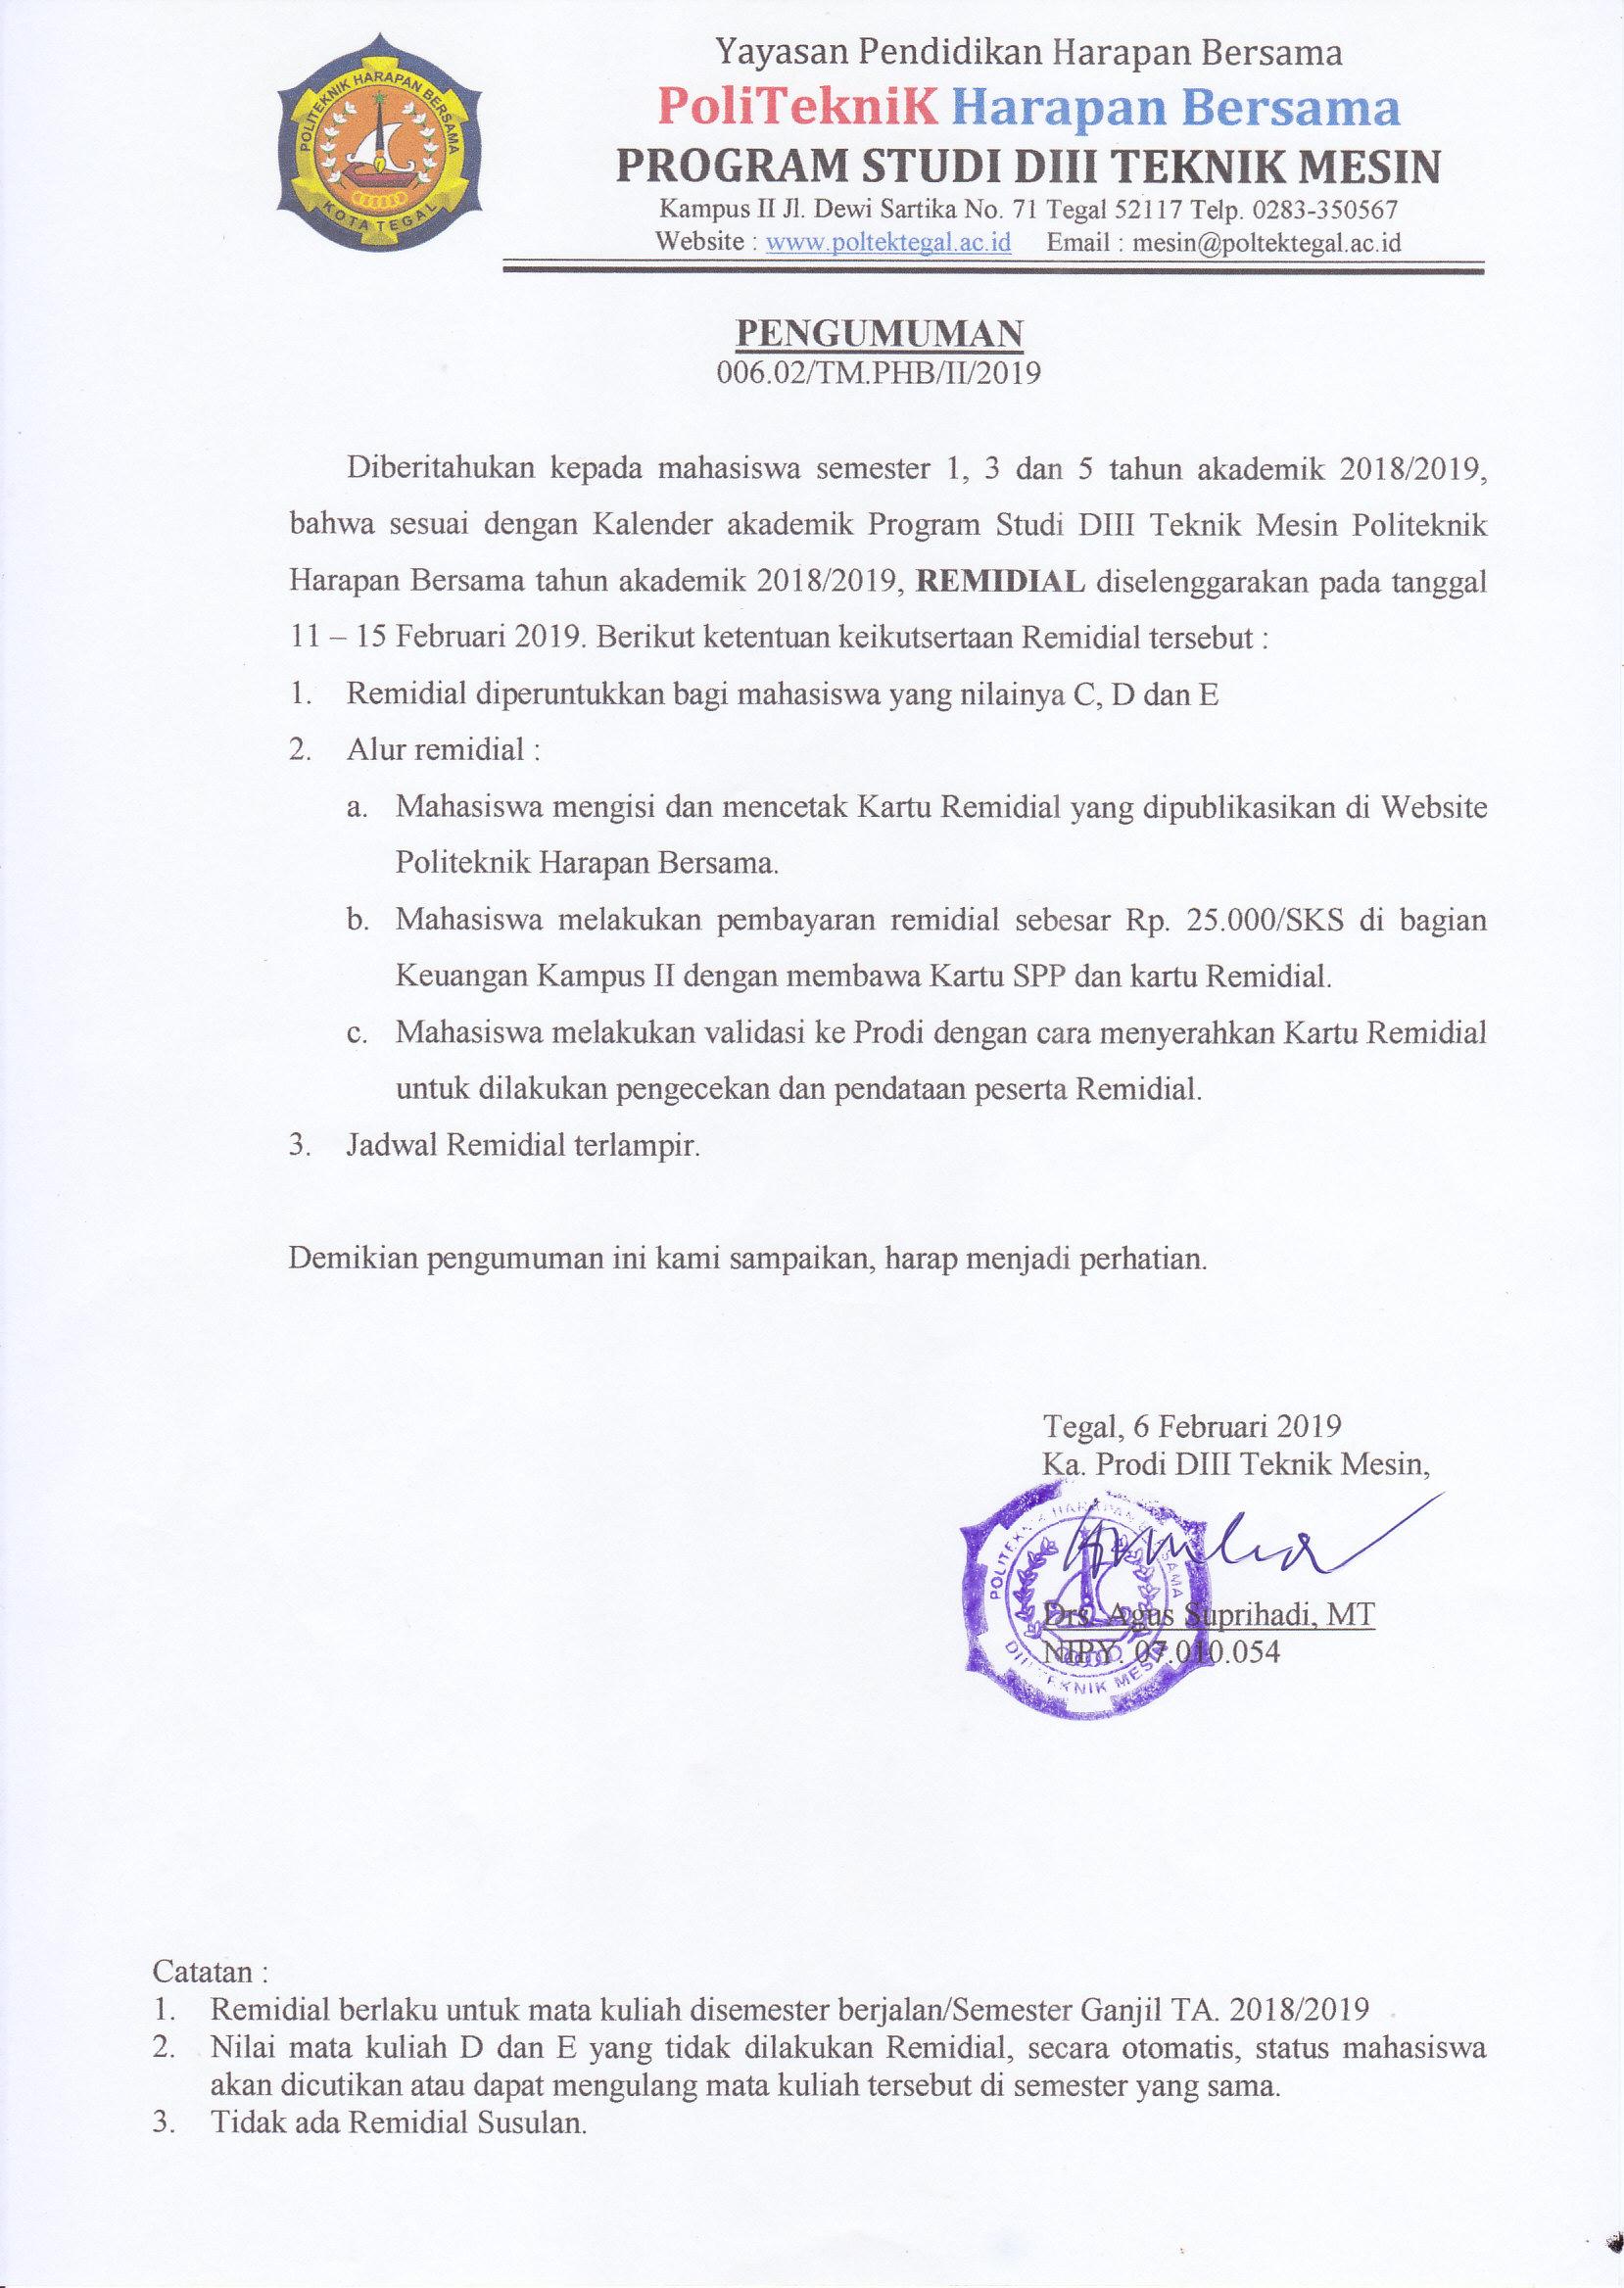 Pengumuman Remidial Semester Ganjil T.A 2018/2019 Prodi Teknik Mesin